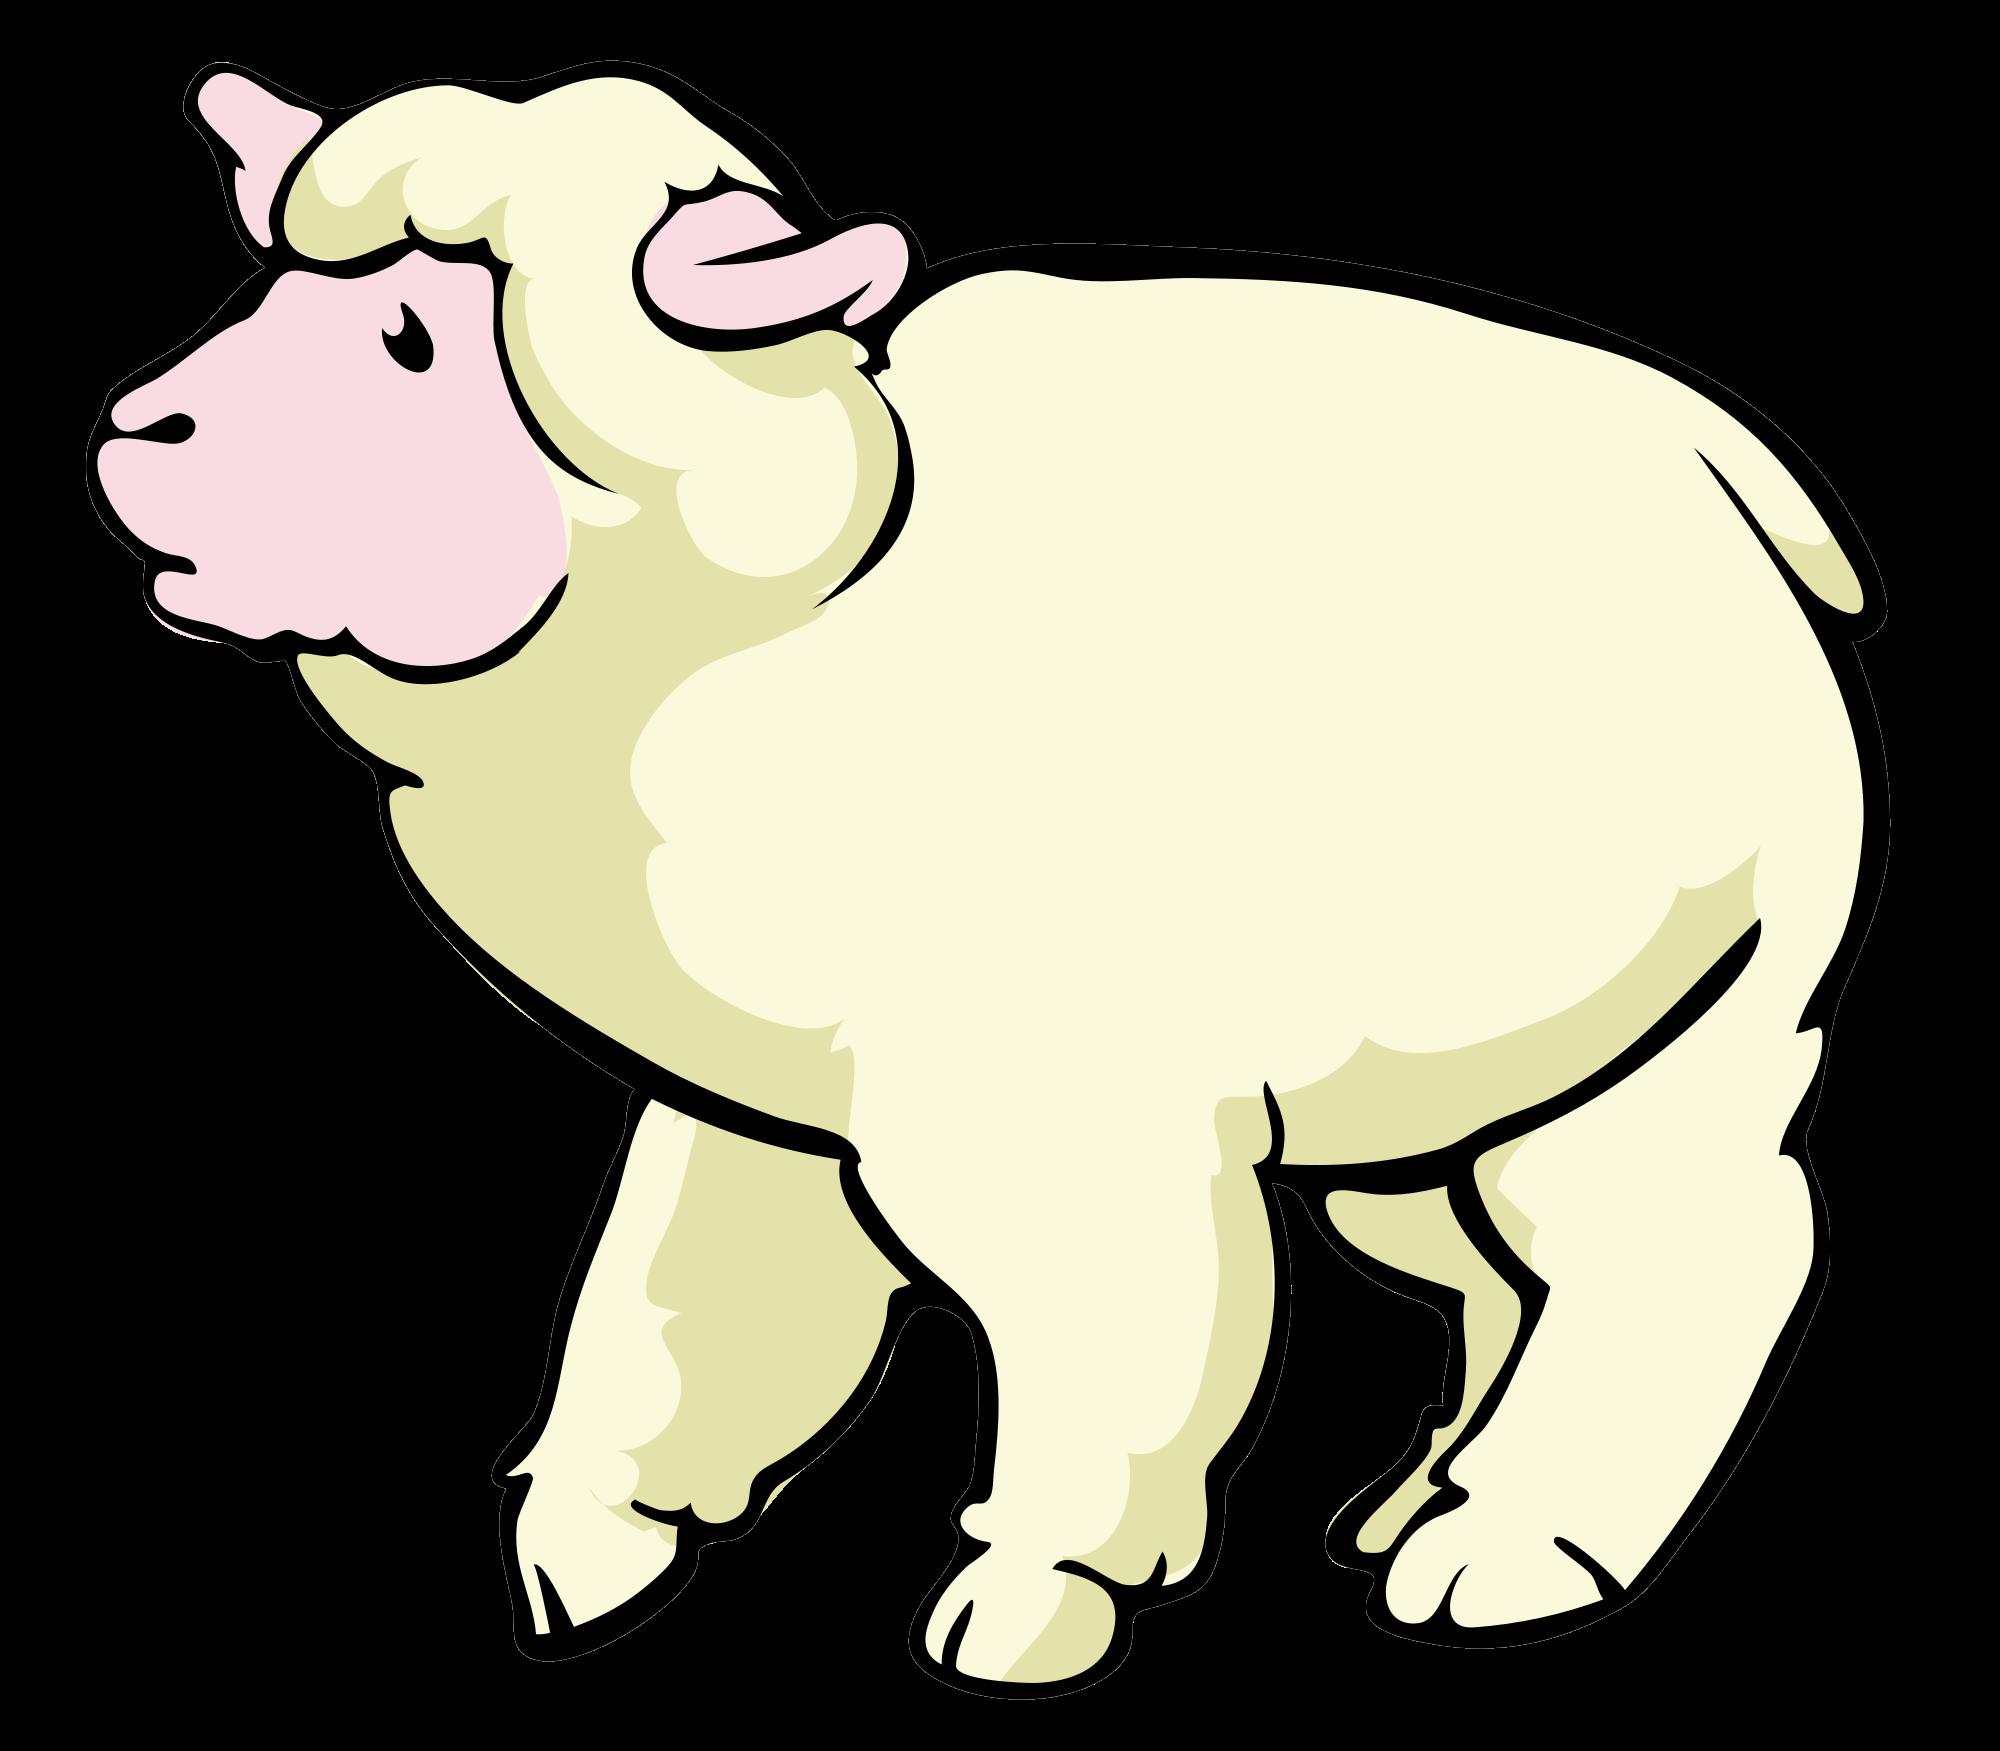 Sheep cartoon svg wikimedia. Lamb clipart file